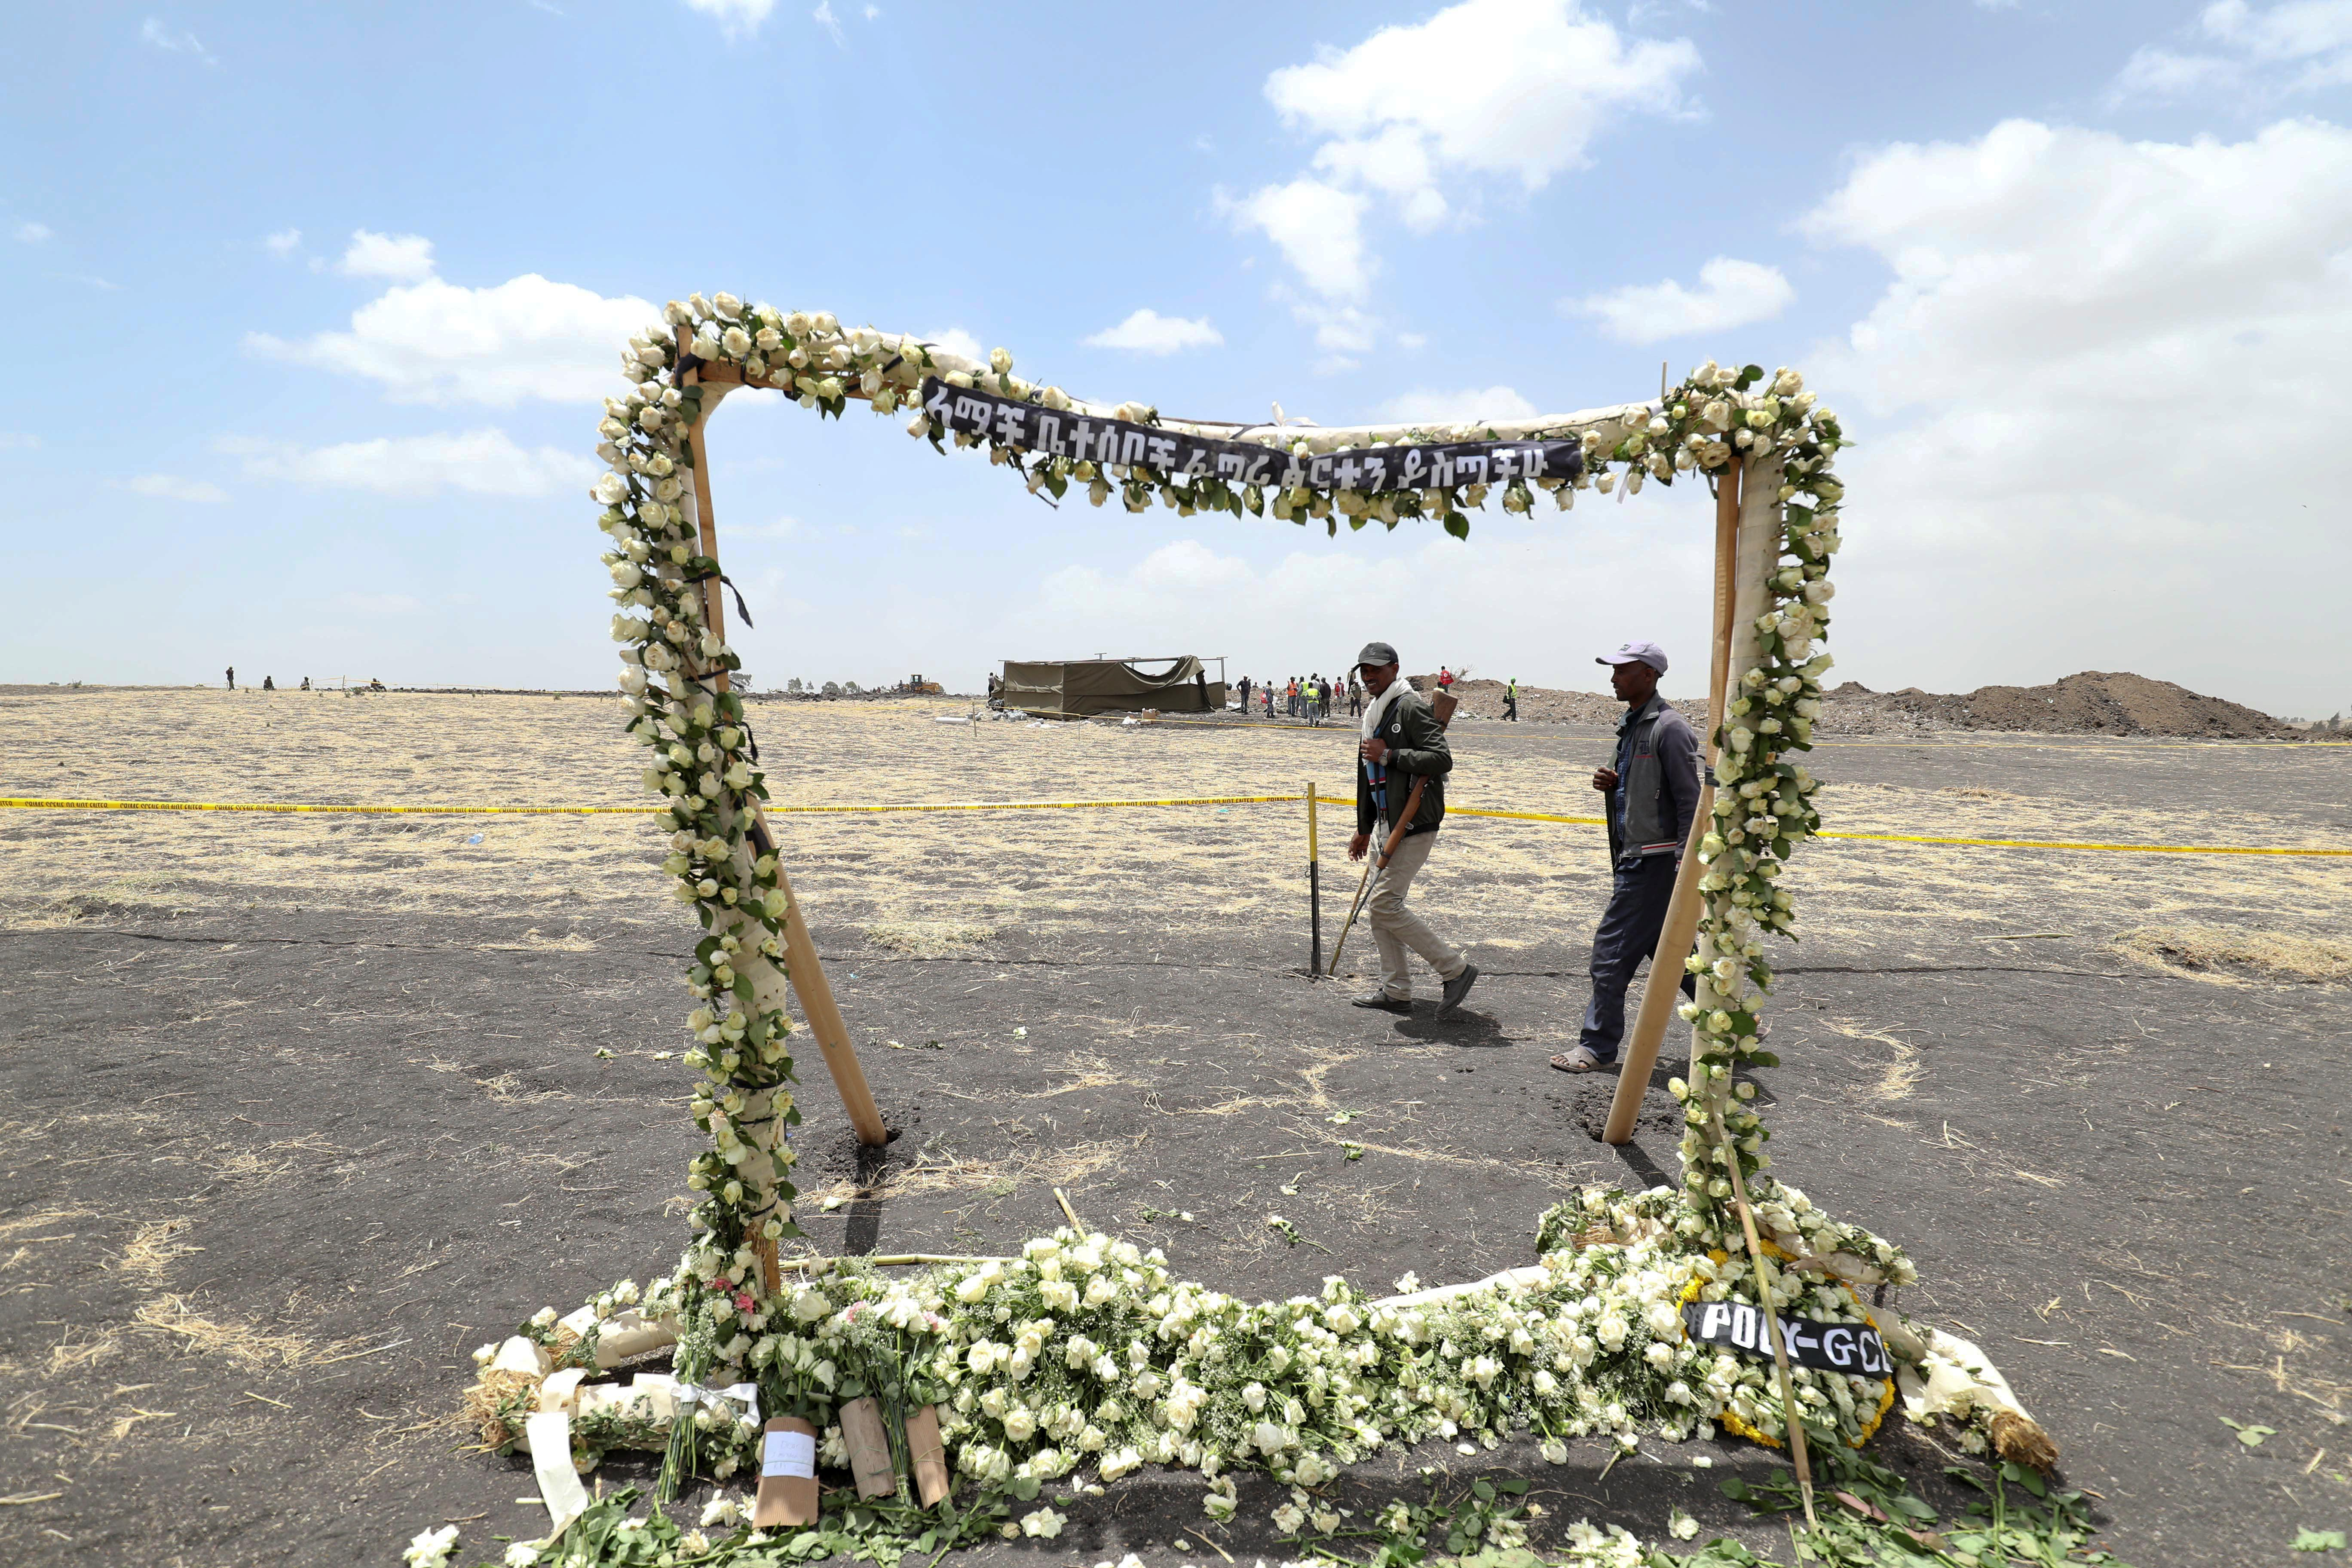 Last remains of Ethiopian plane crash victims buried, families say...